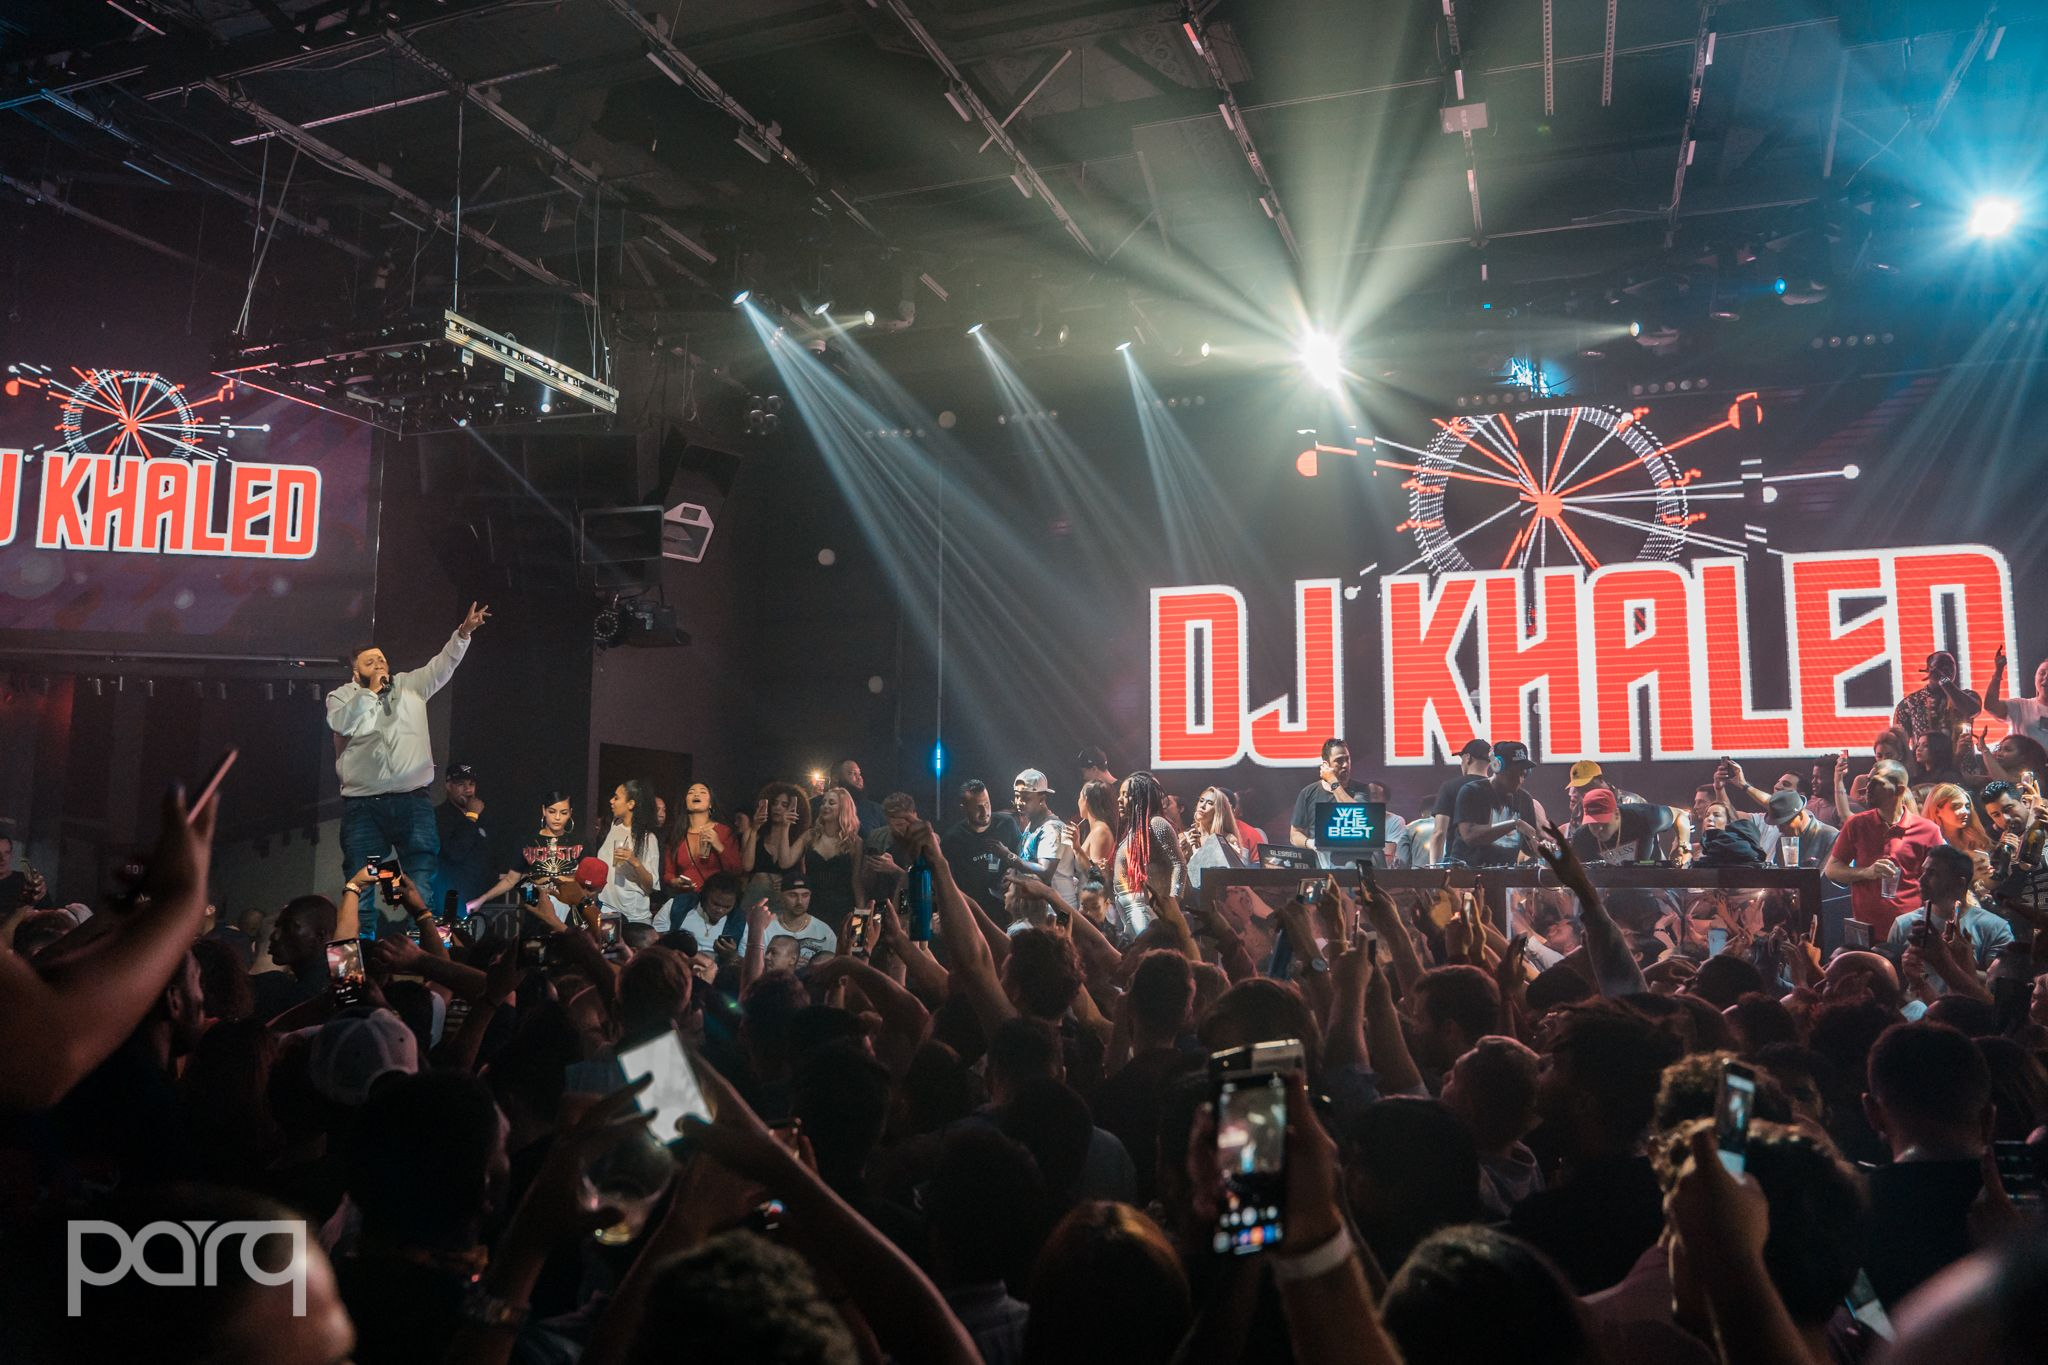 09.27.18 Parq - DJ Khaled-29.jpg